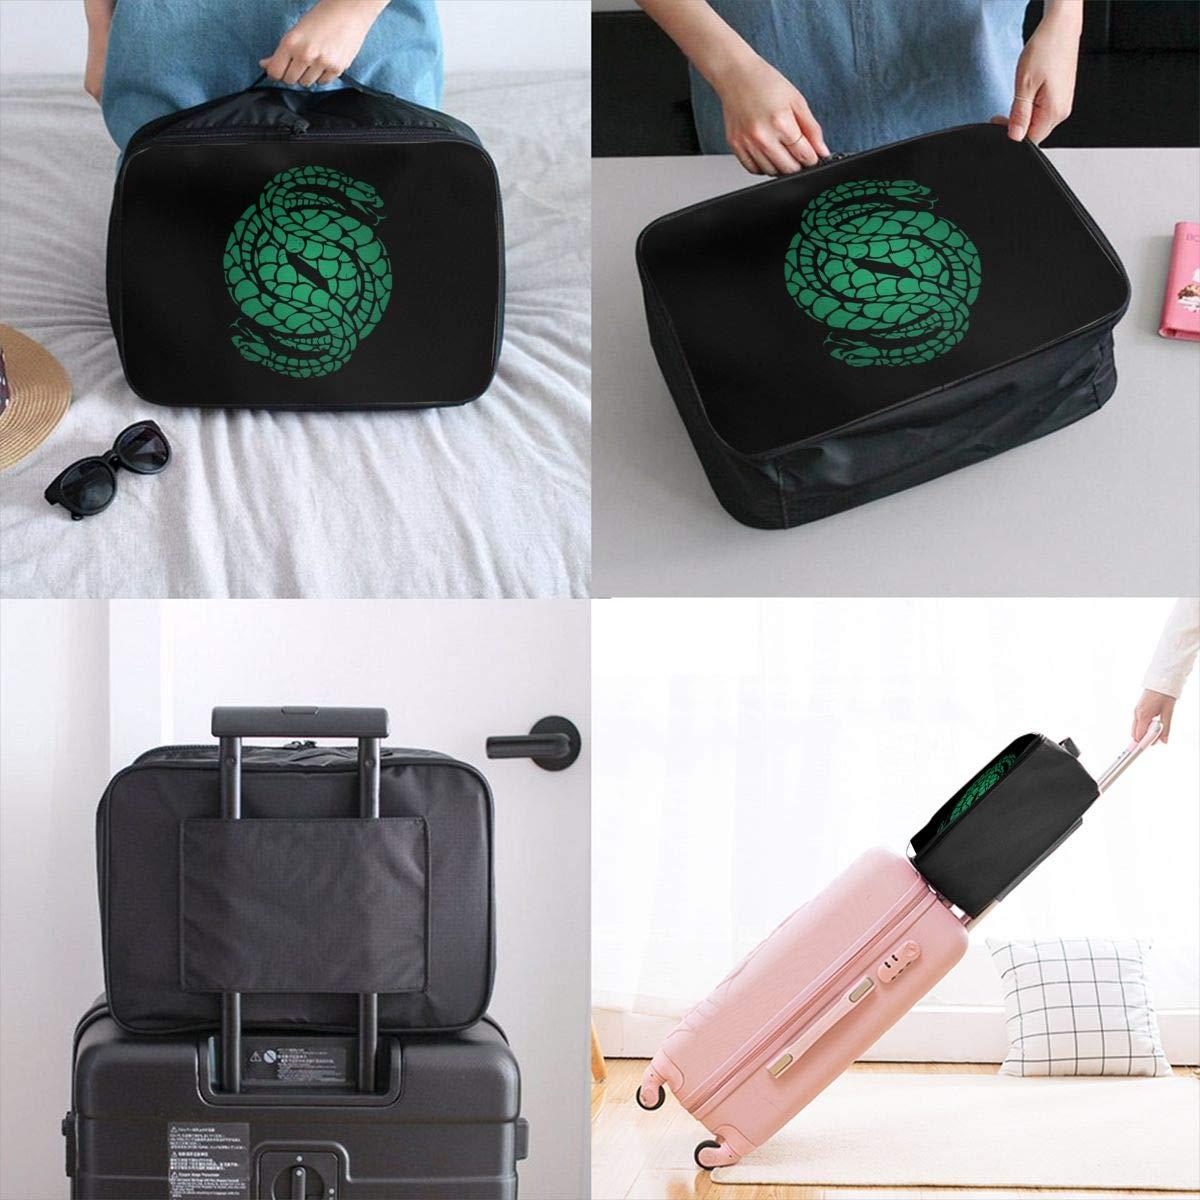 Des-Tiny 2 Gambit Travel Luggage Storage Bag Duffel Bag Handle Makeup Bag Fashion Lightweight Large Capacity Portable Luggage Bag